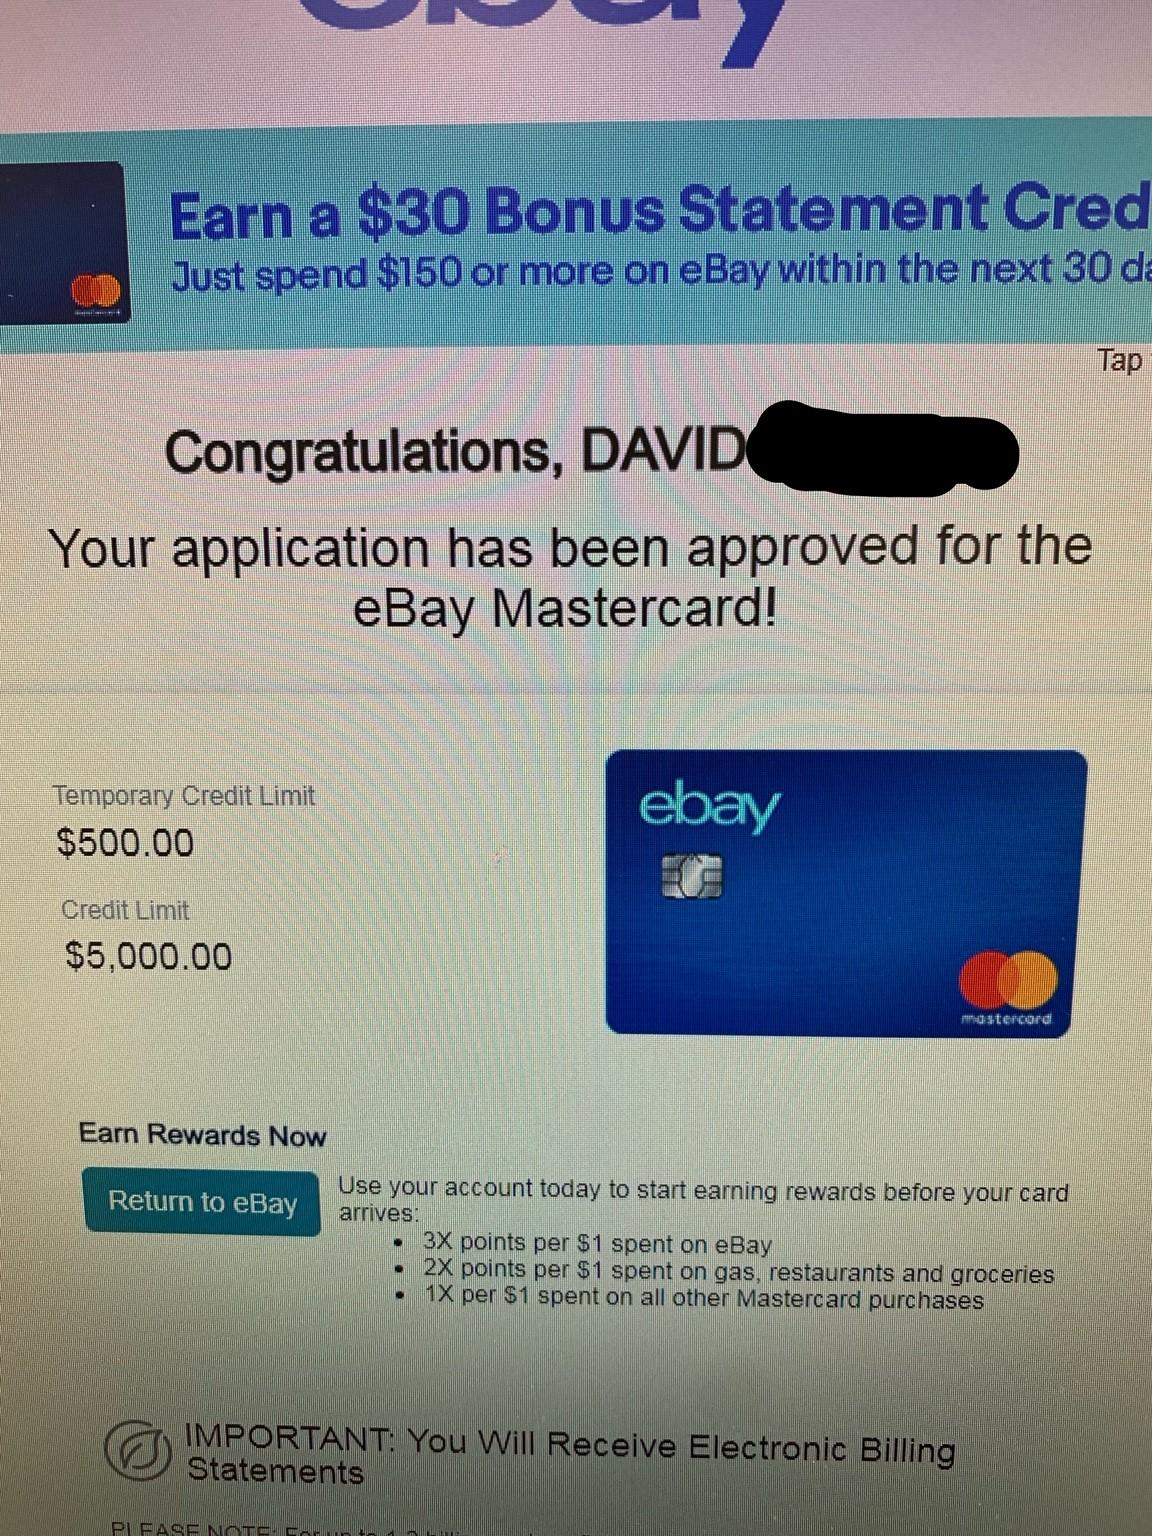 Ebay Mastercard Login >> Synchrony Loves Me Suddenly Ebay Mastercard Appro